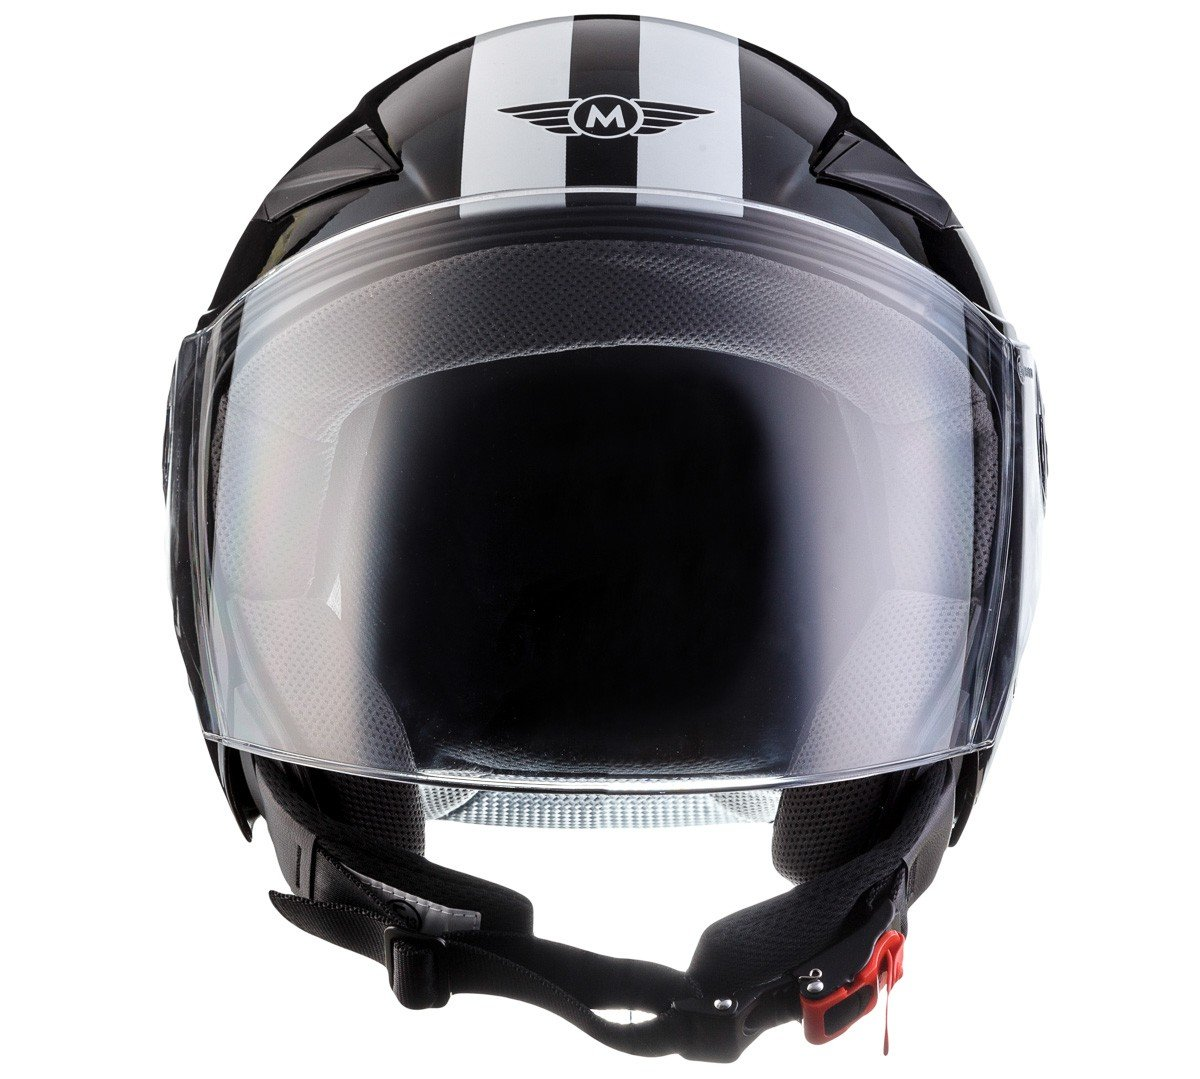 MOTO U52 Racing Red /· Biker Vespa Scooter Retro Urban Casco Demi-Jet Cruiser Helmet Moto motocicleta Urbano Vintage Piloto Bobber Chopper Mofa /· ECE certificado /· visera incluido /· incluyendo bolsa de casco /· Rojo /·